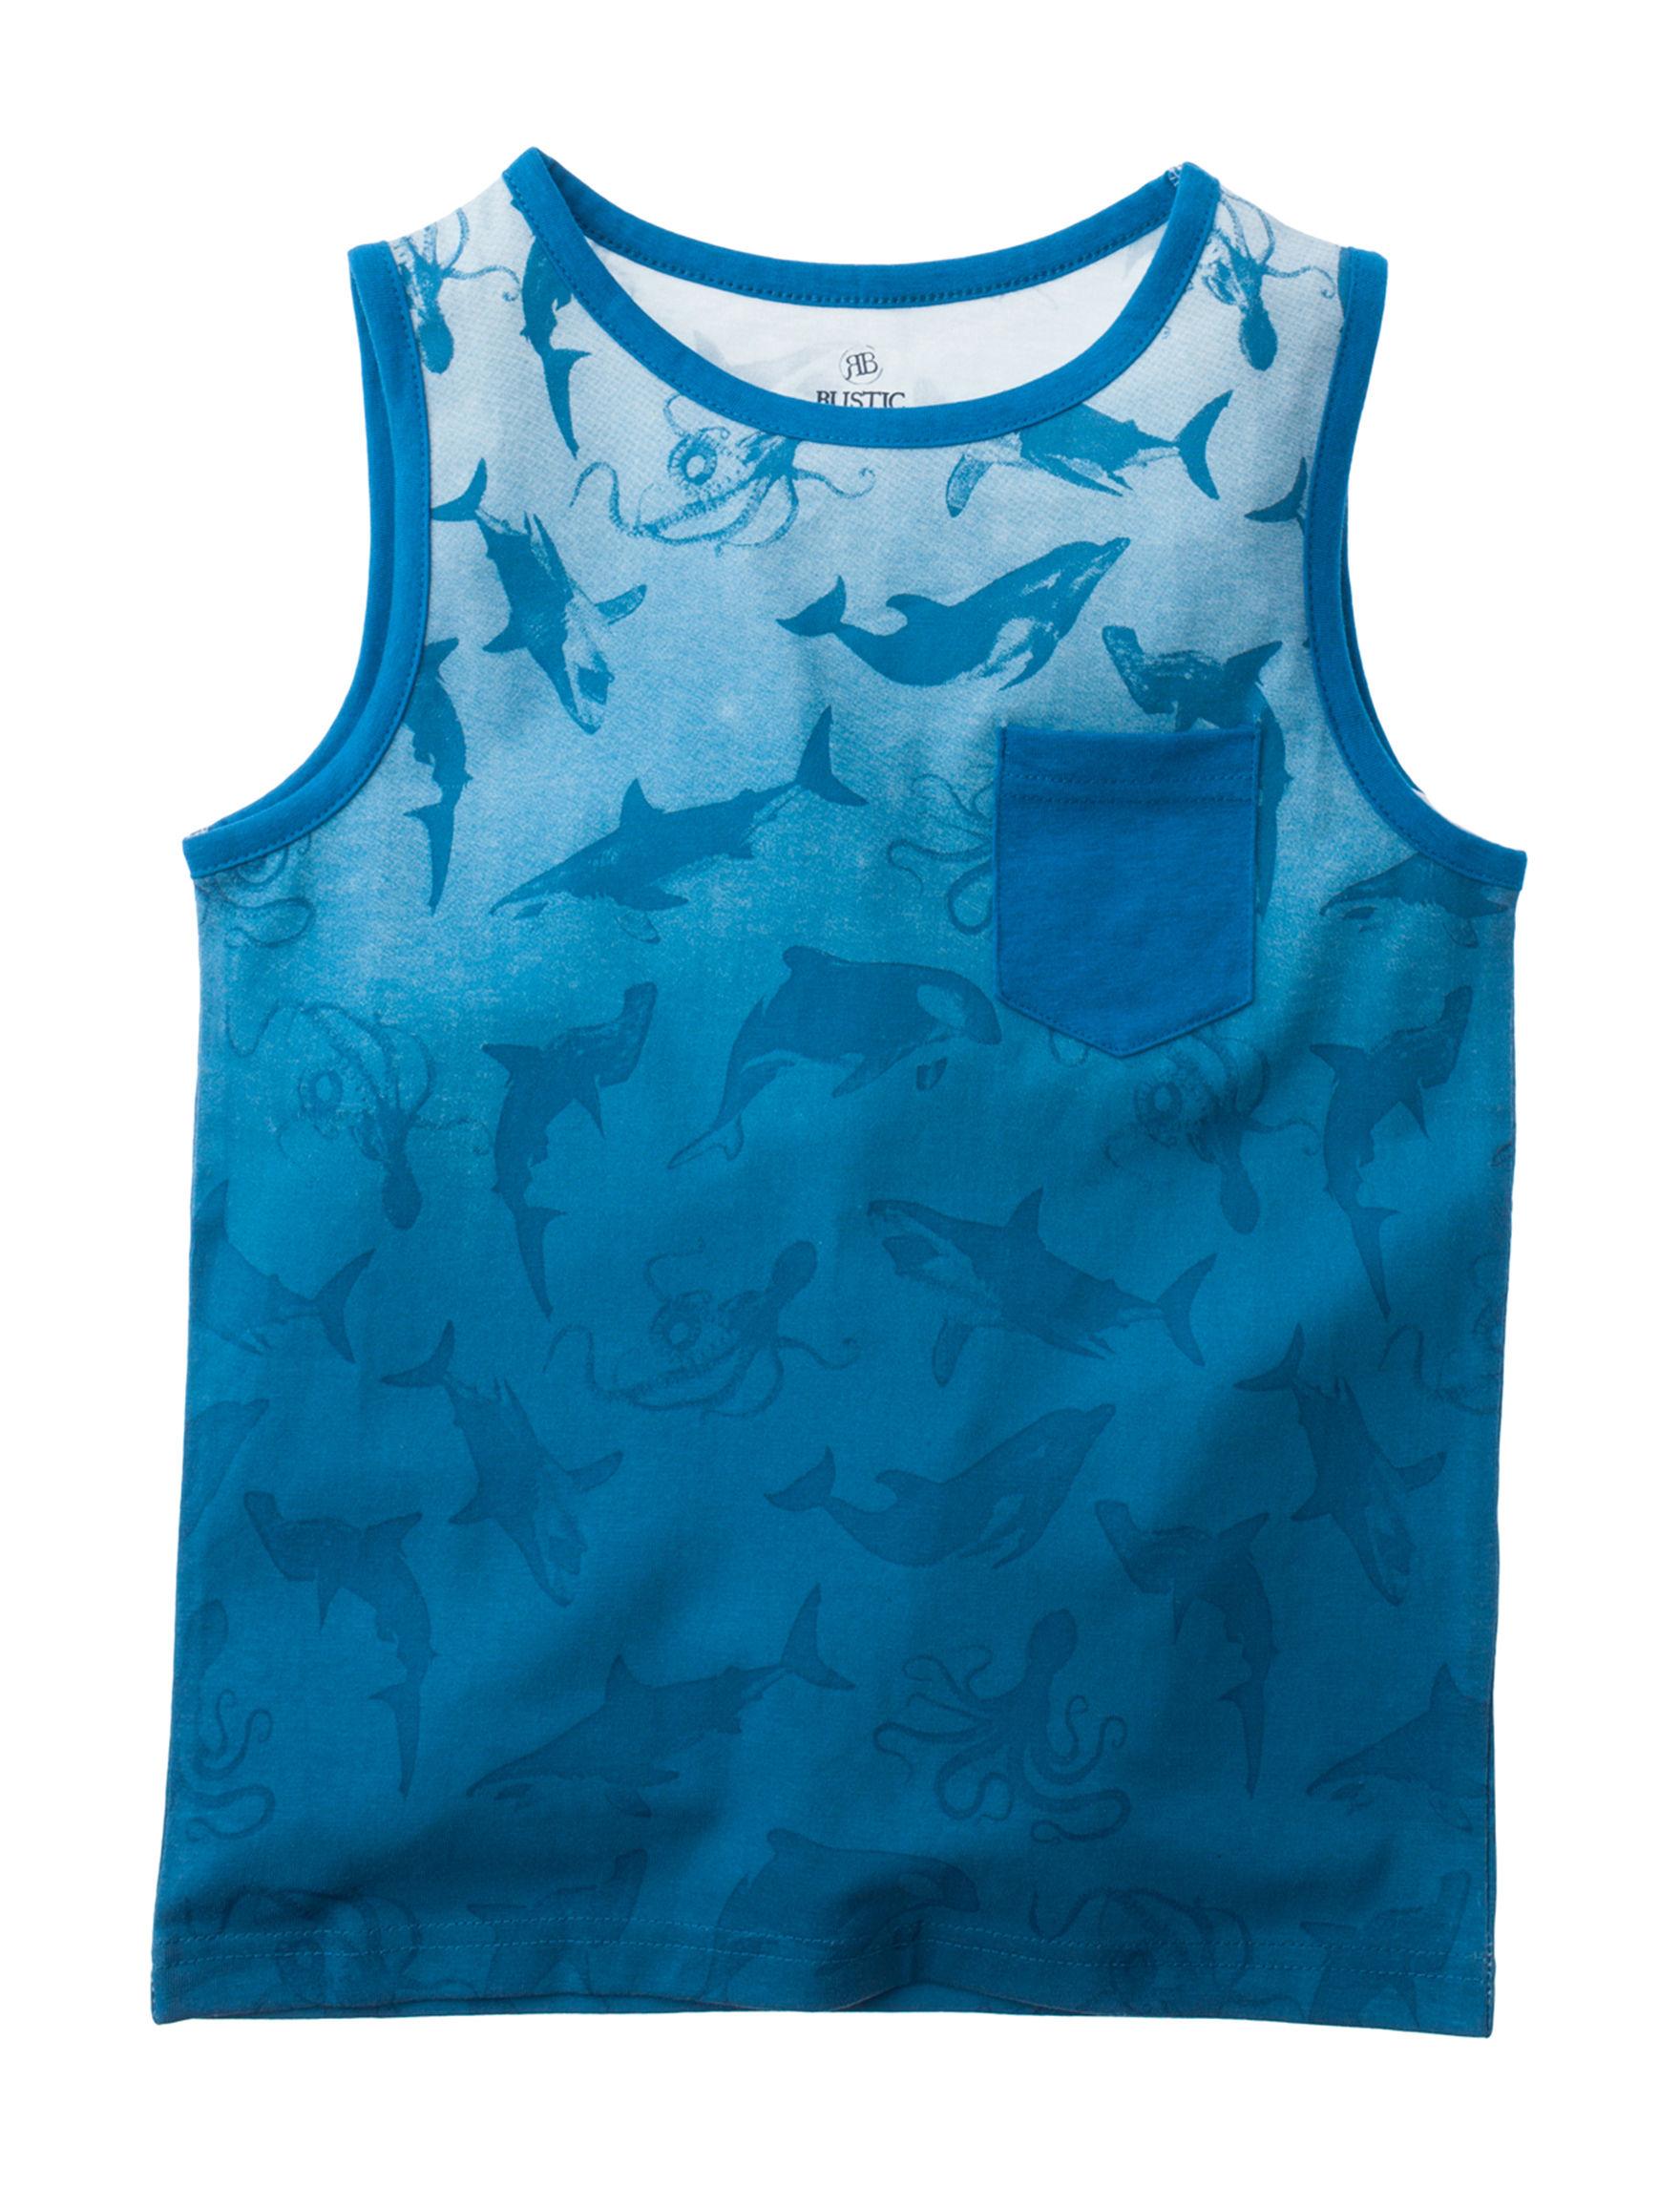 Rustic Blue Turquoise Tees & Tanks